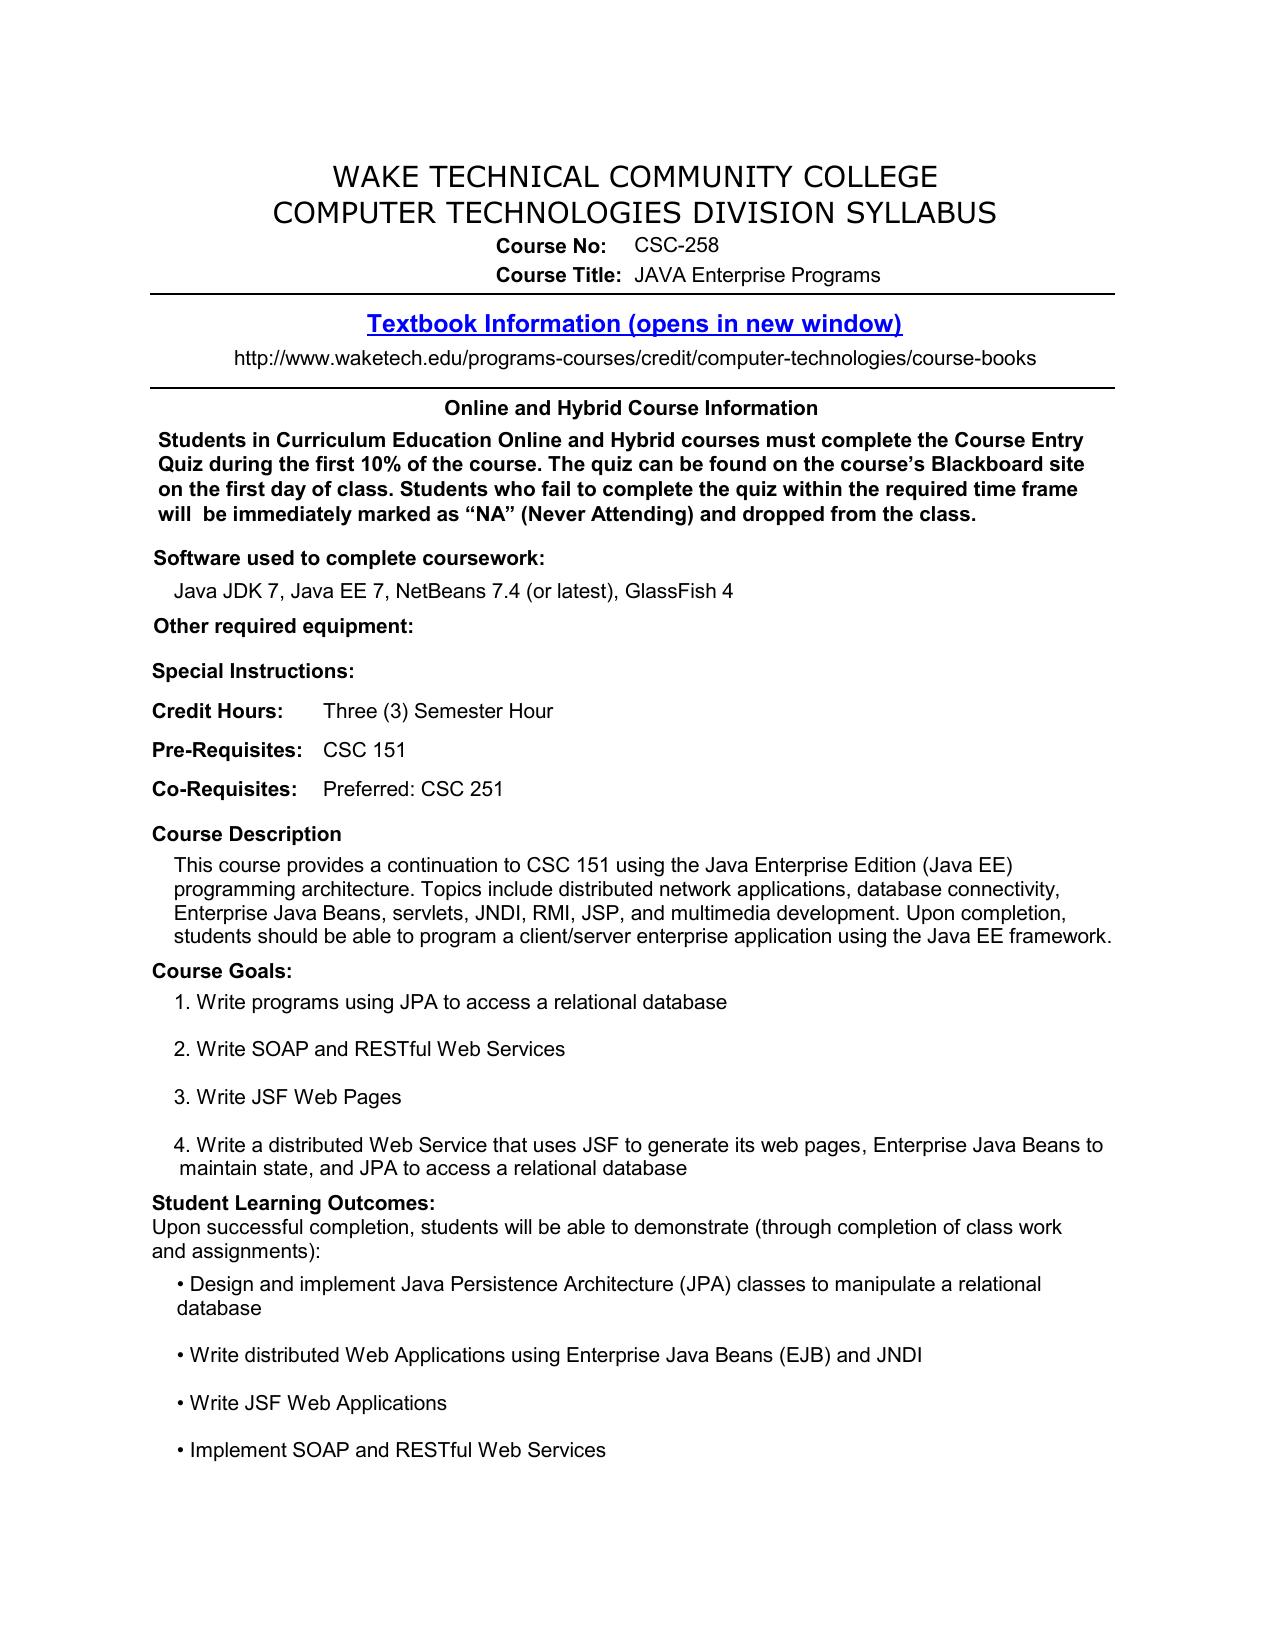 CSC-258 - Wake Technical Community College